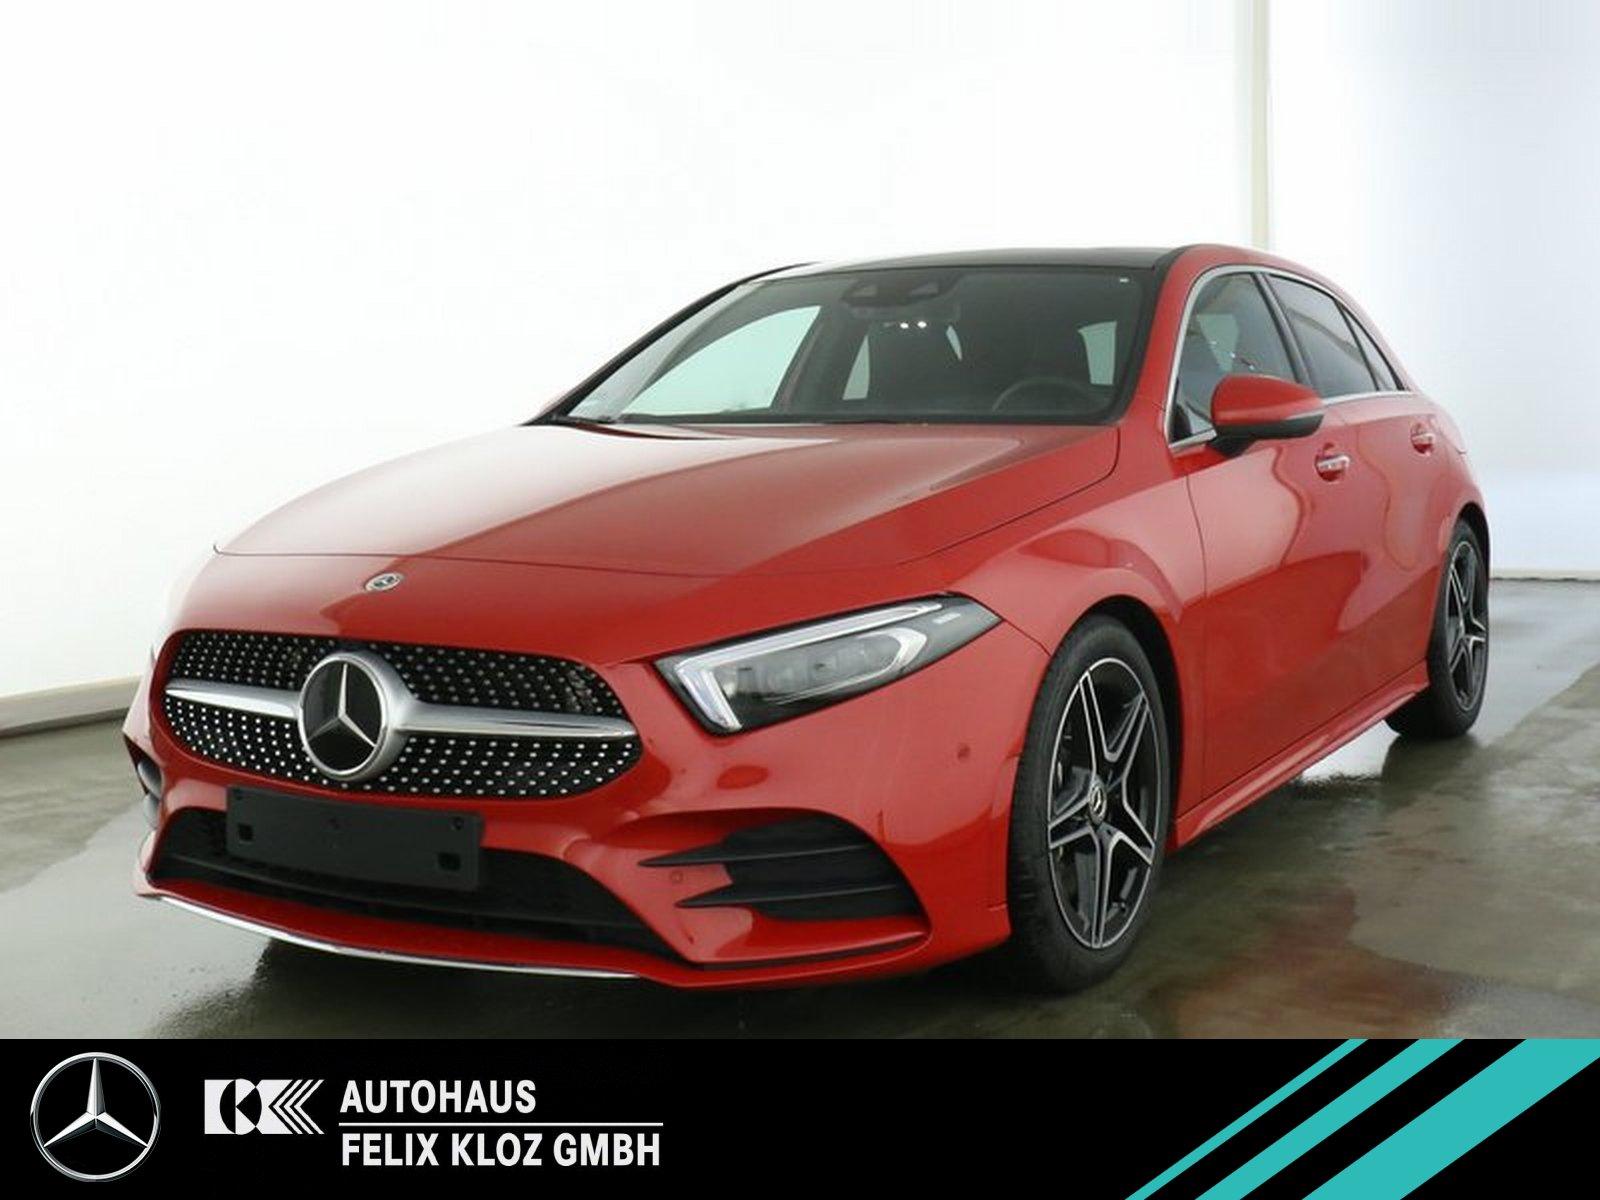 Mercedes-Benz A 200 AMG Pano HUD 360 FAP Burmester Technik-Pak, Jahr 2019, Benzin